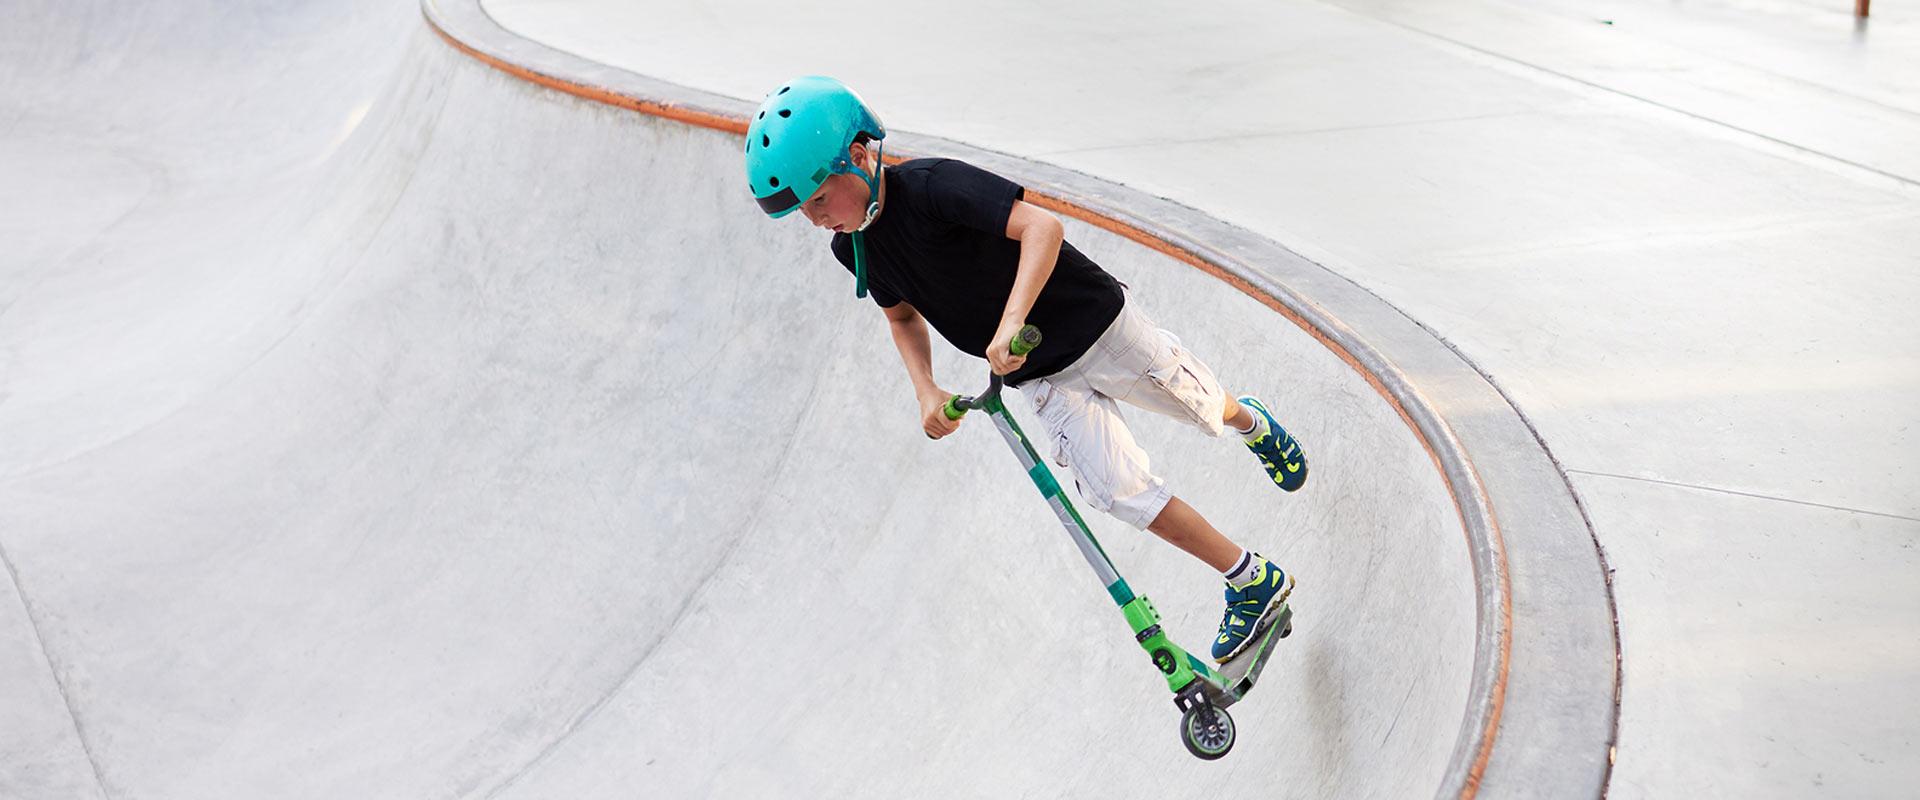 Cox Swain Stunt Scooter